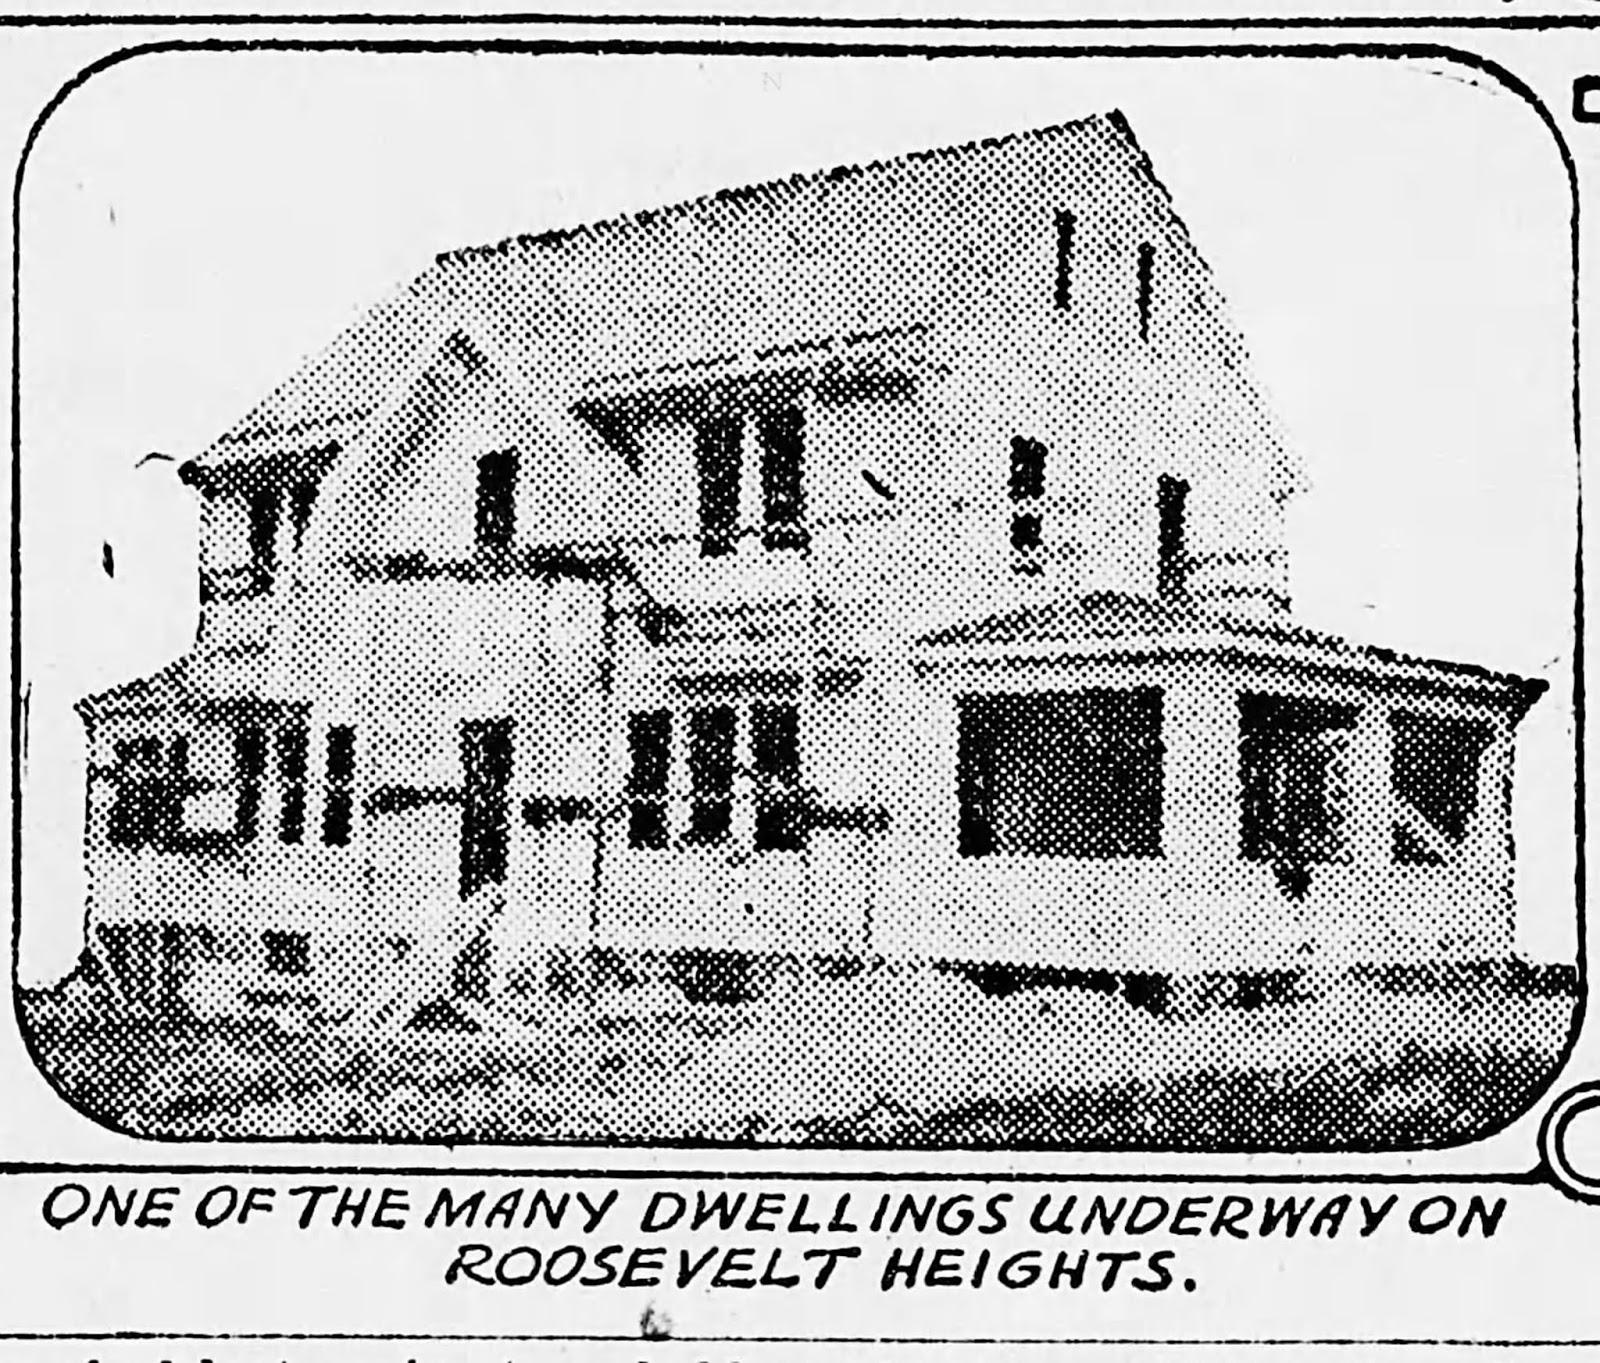 Historic Pelham: Real Estate Boom Began The Roaring